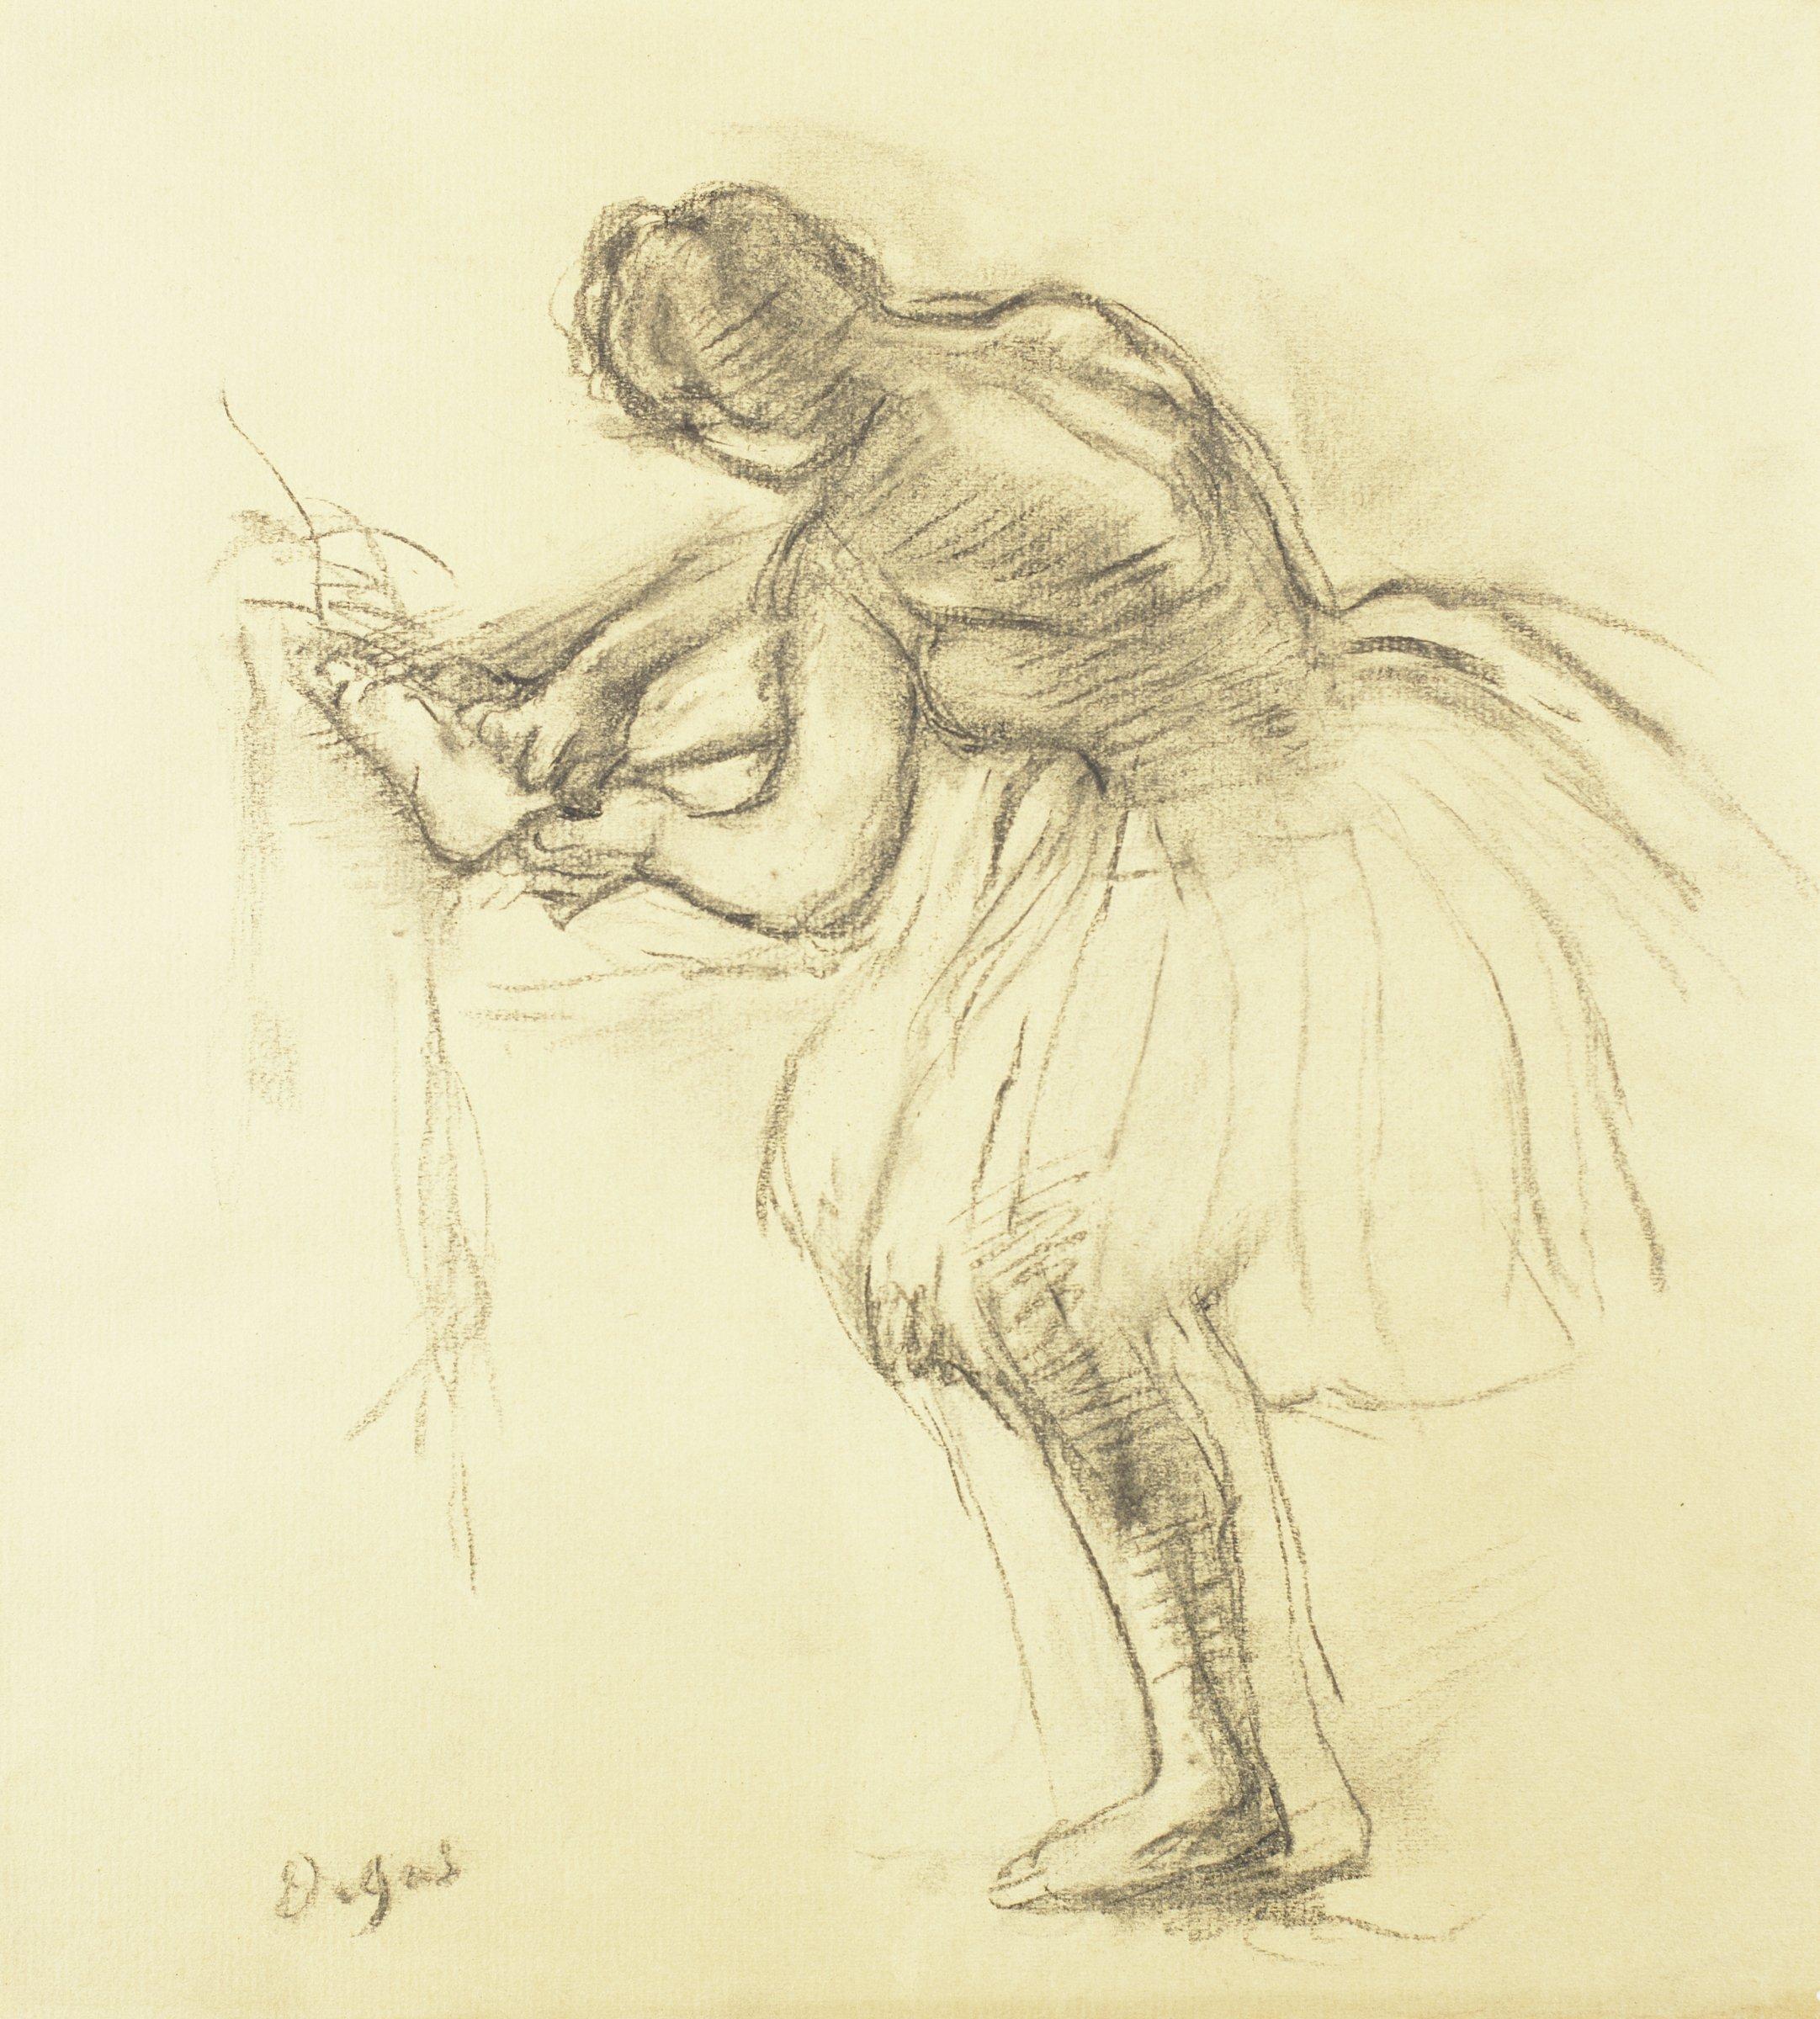 Balleteuse (Ballet Dancer), Edgar Degas, charcoal on laid paper